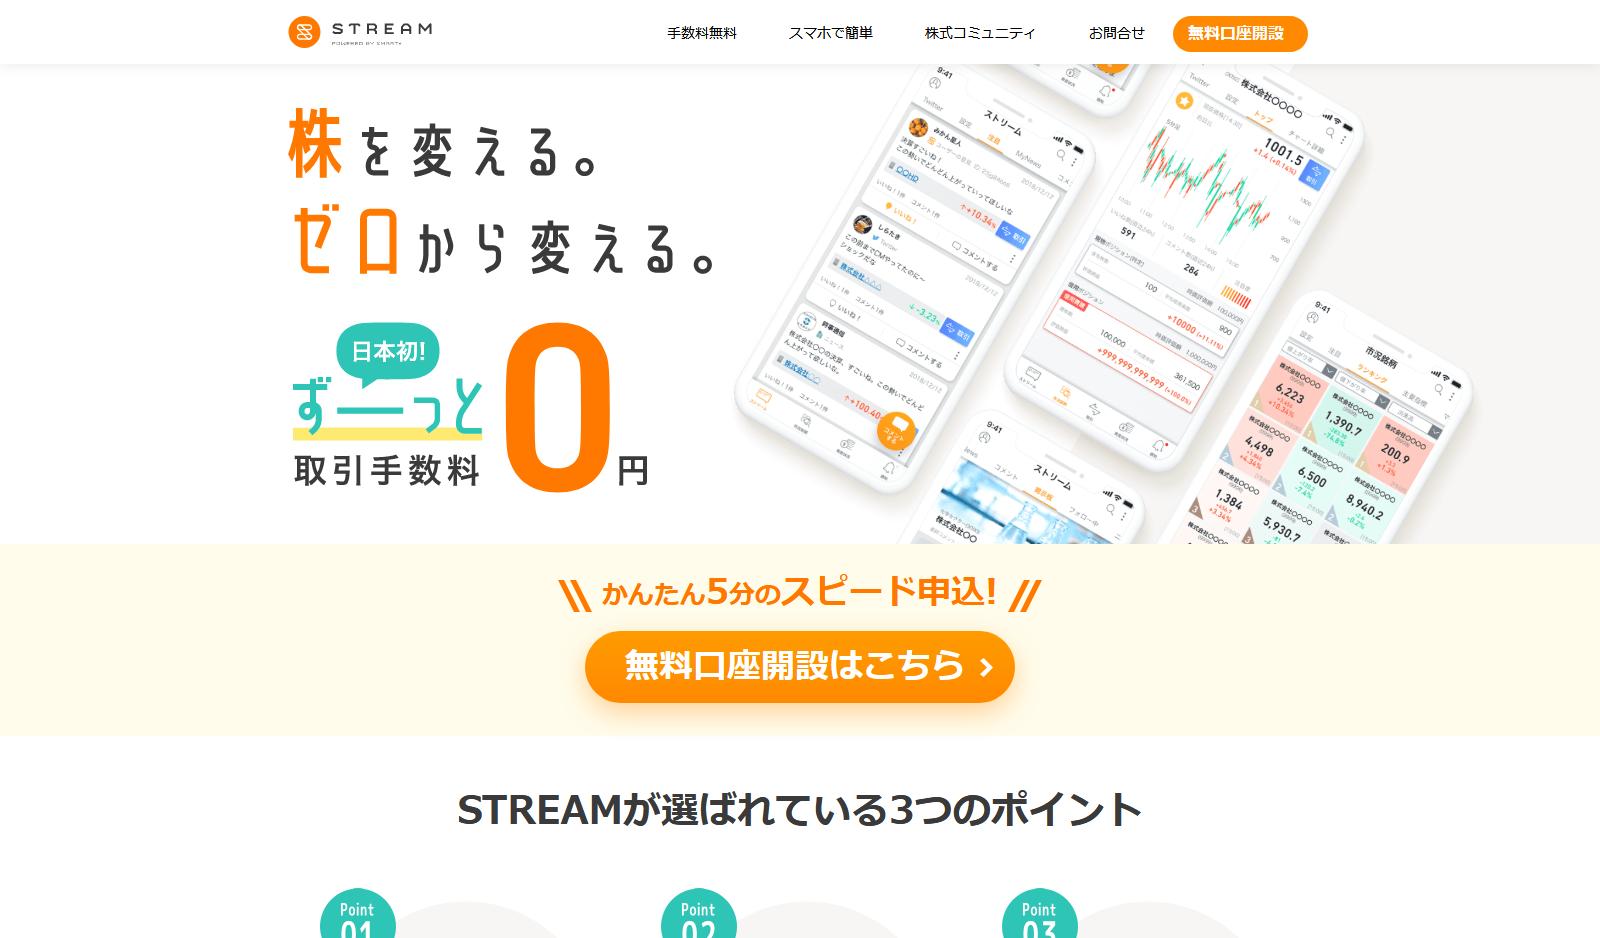 STREAM(ストリーム)|株を変える。ゼロから変える - 日本初!ずーっと取引手数料0円の株取引アプリ